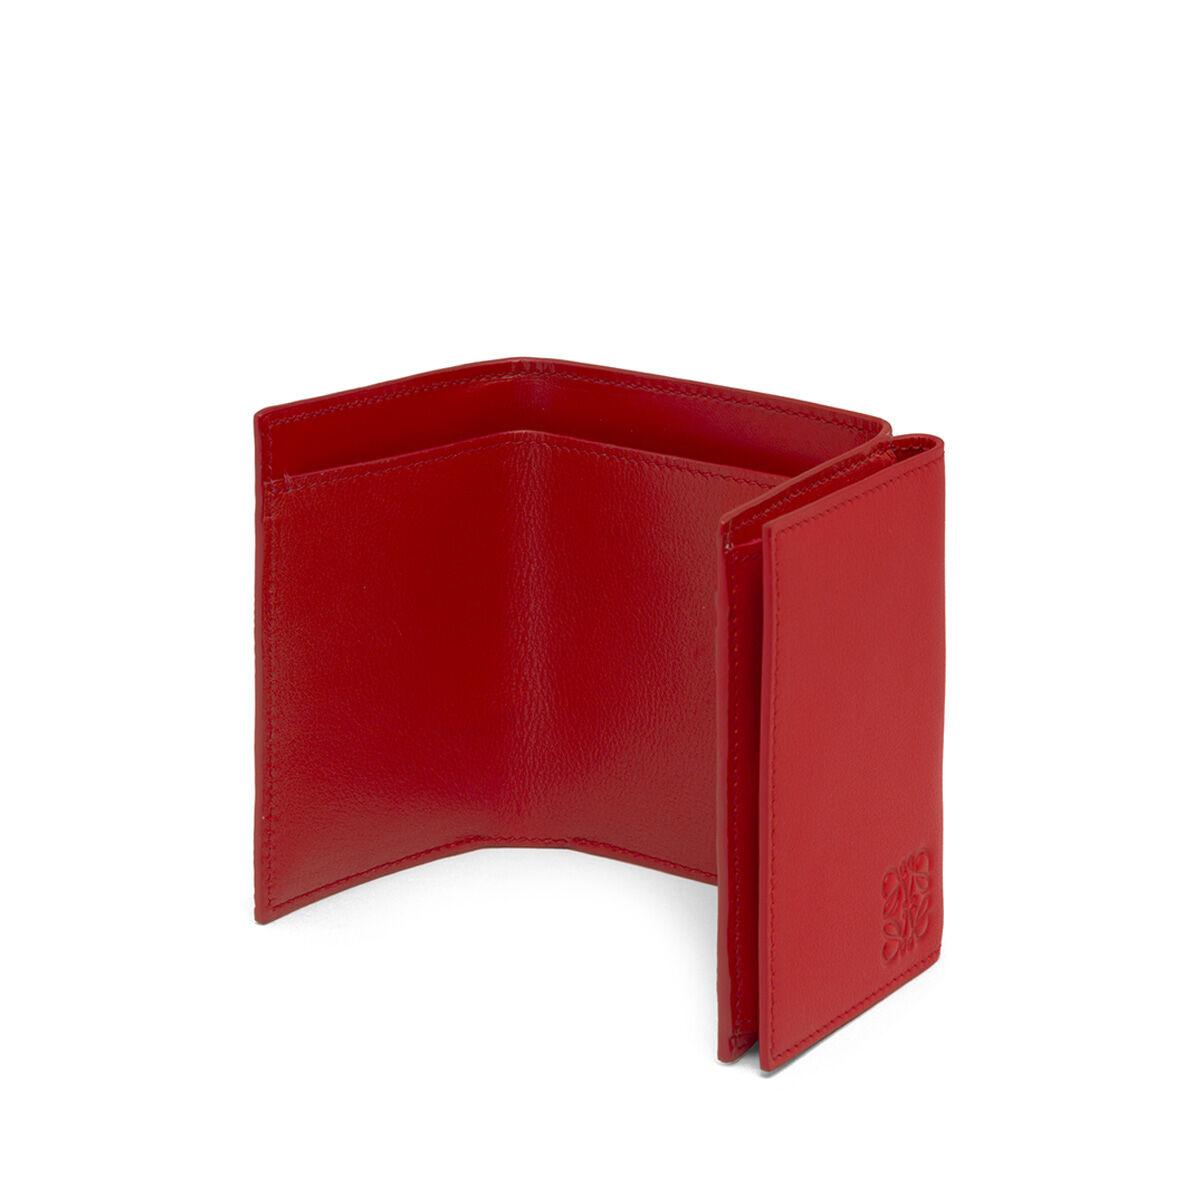 LOEWE Linen Trifold Wallet Scarlet Red front